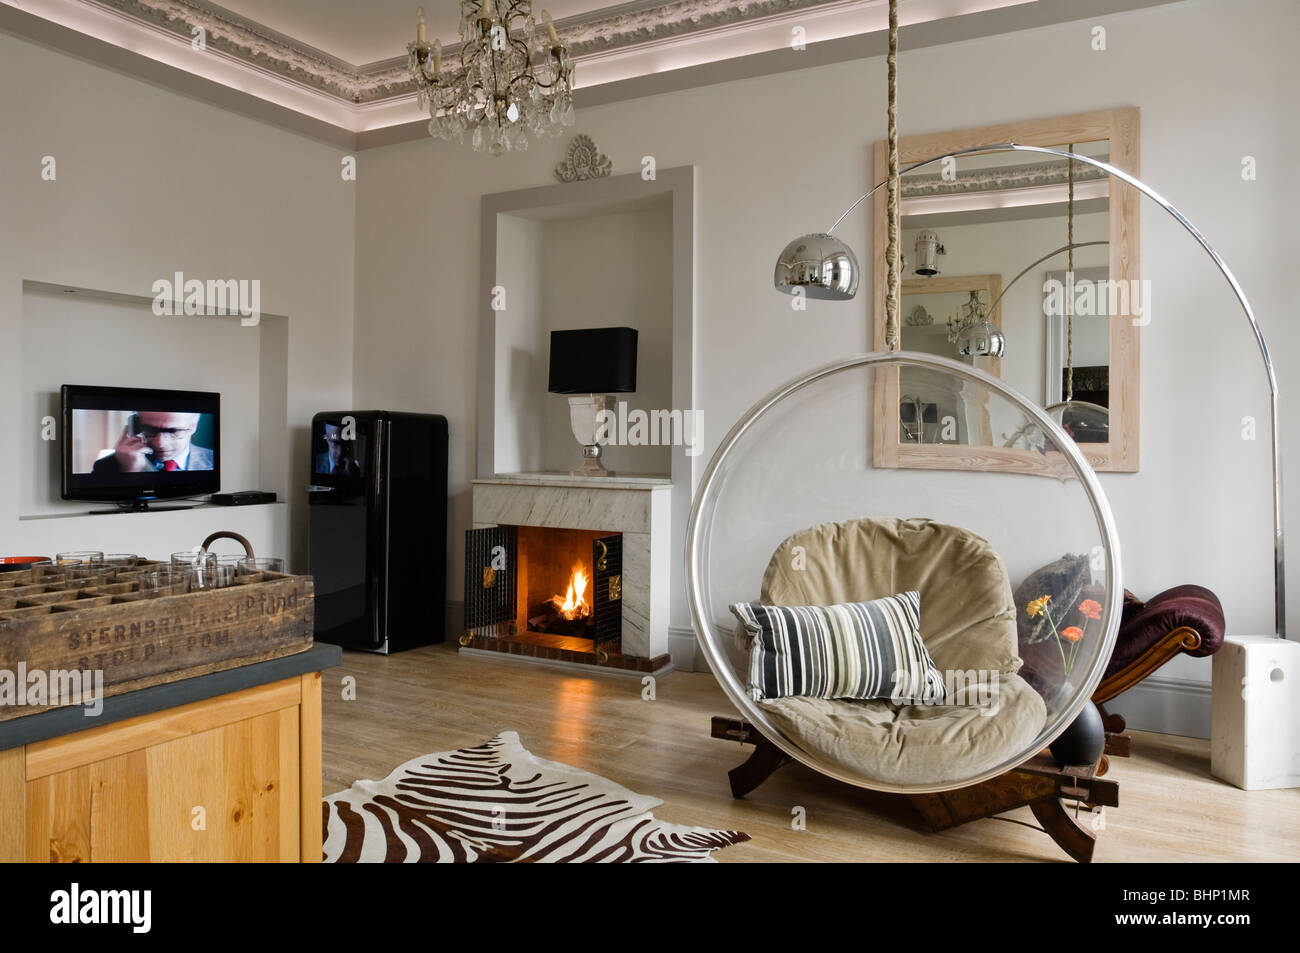 eero aarnio bubble chair pink canopy lovingheartdesigns in living room with zebra skin saveenlarge